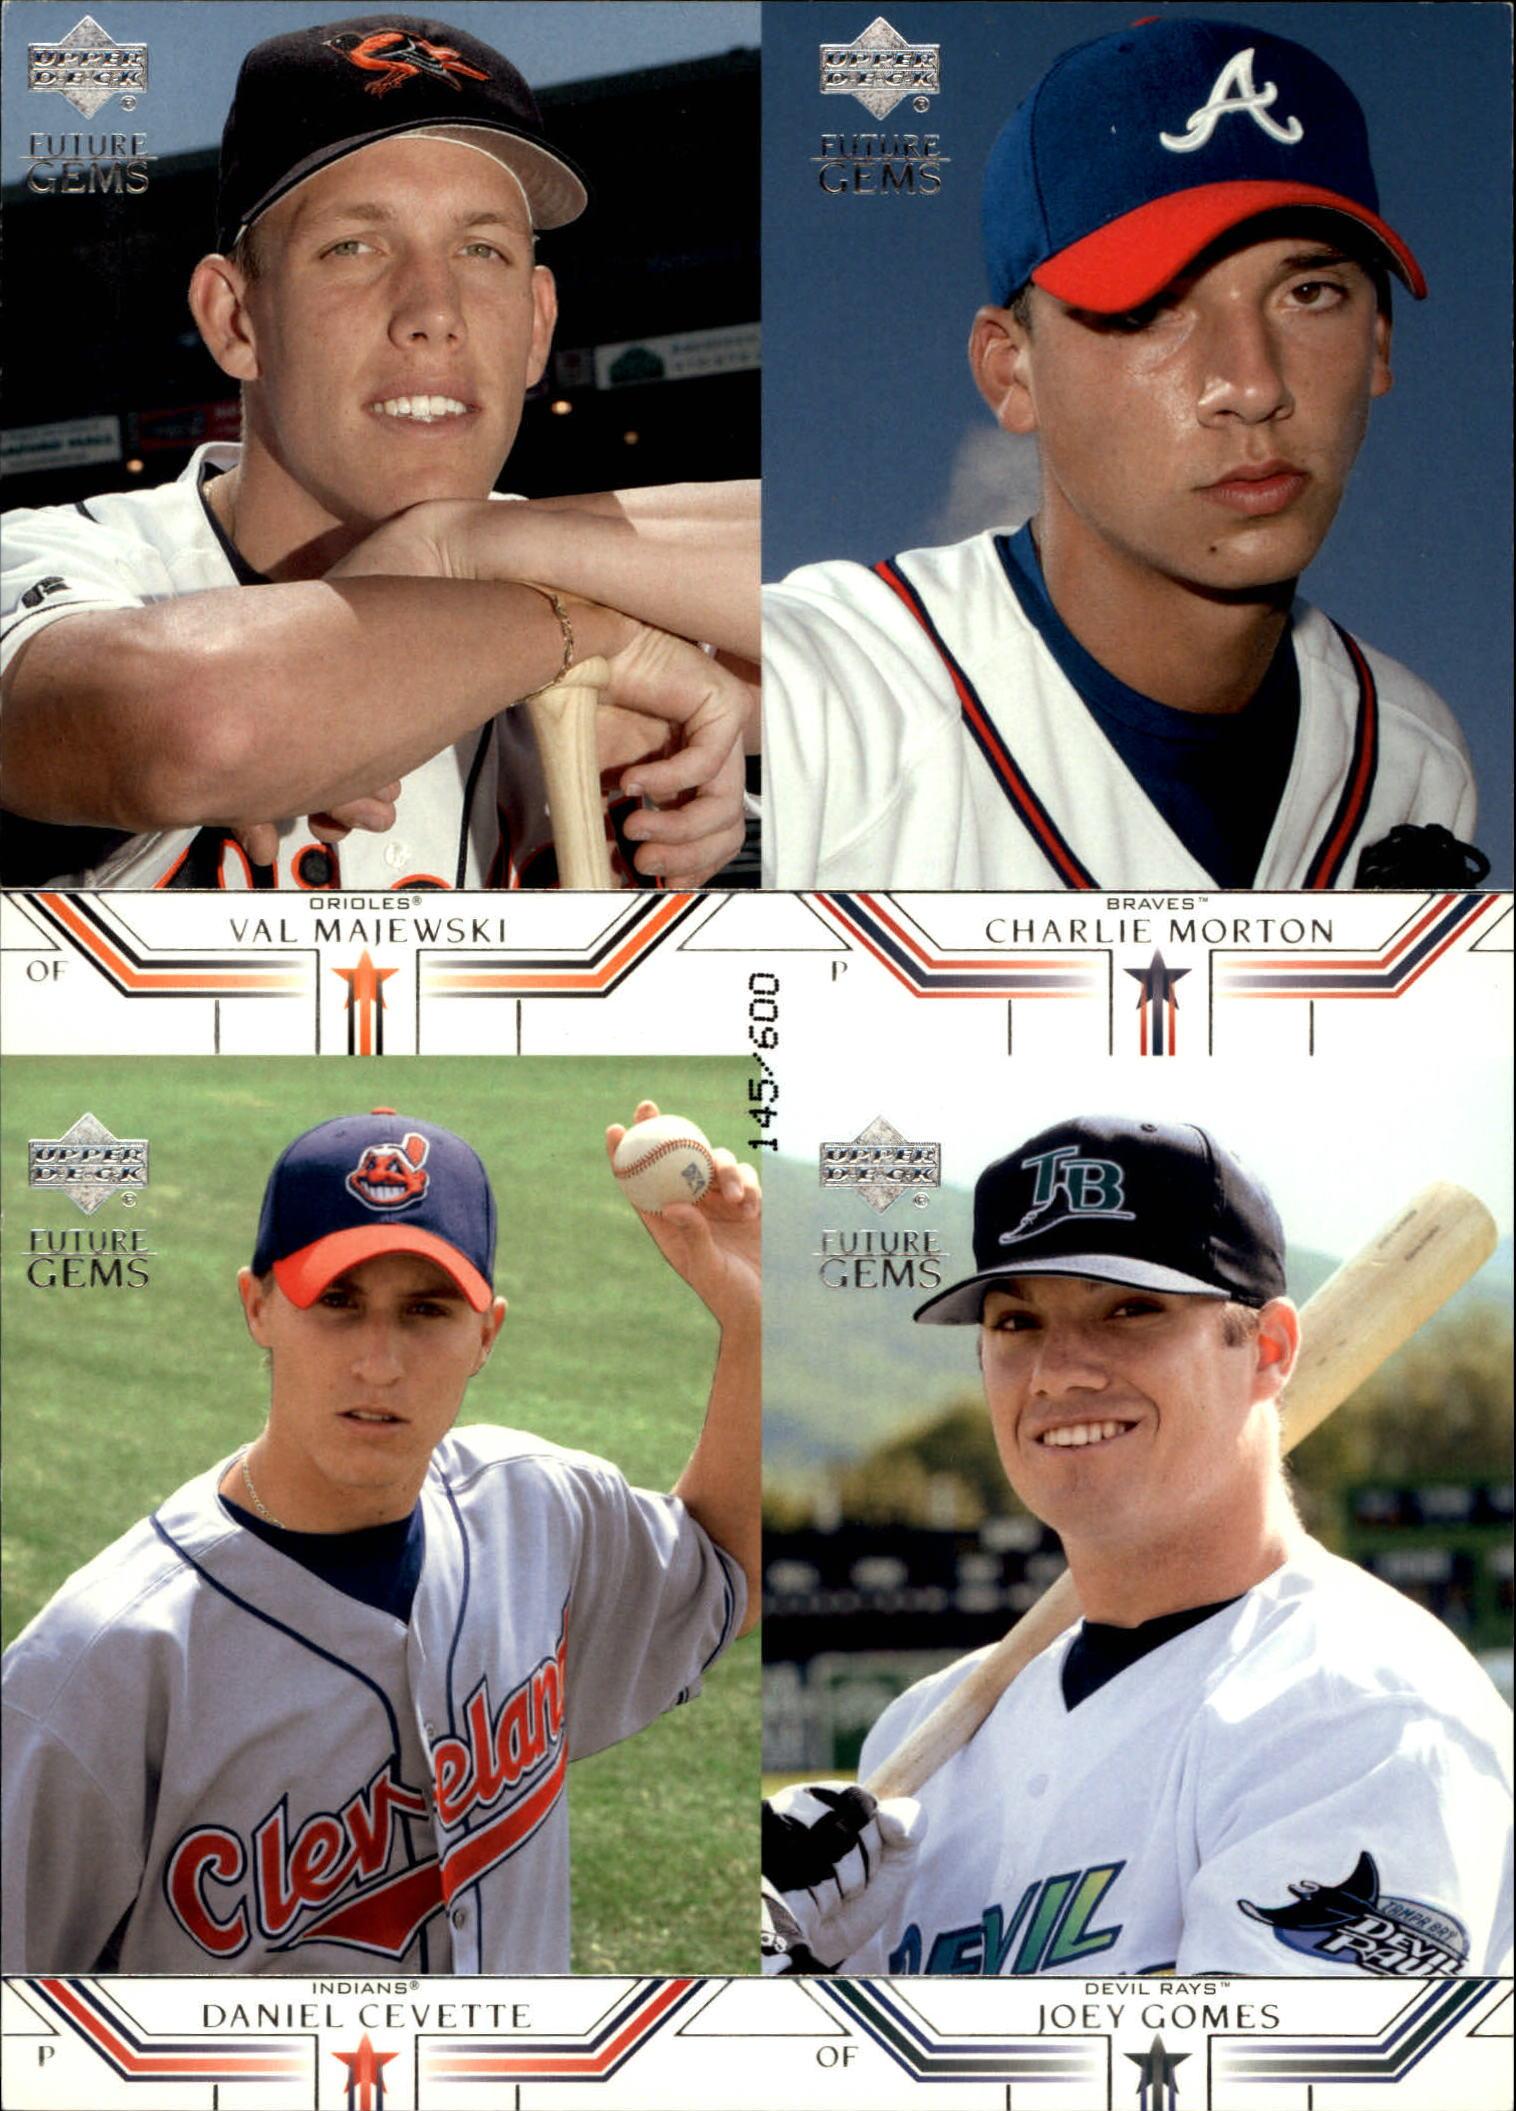 2002 Upper Deck Prospect Premieres Future Gems Quads #19 Val Majewski/Charlie Morton/Daniel Cevette/Joey Gomes